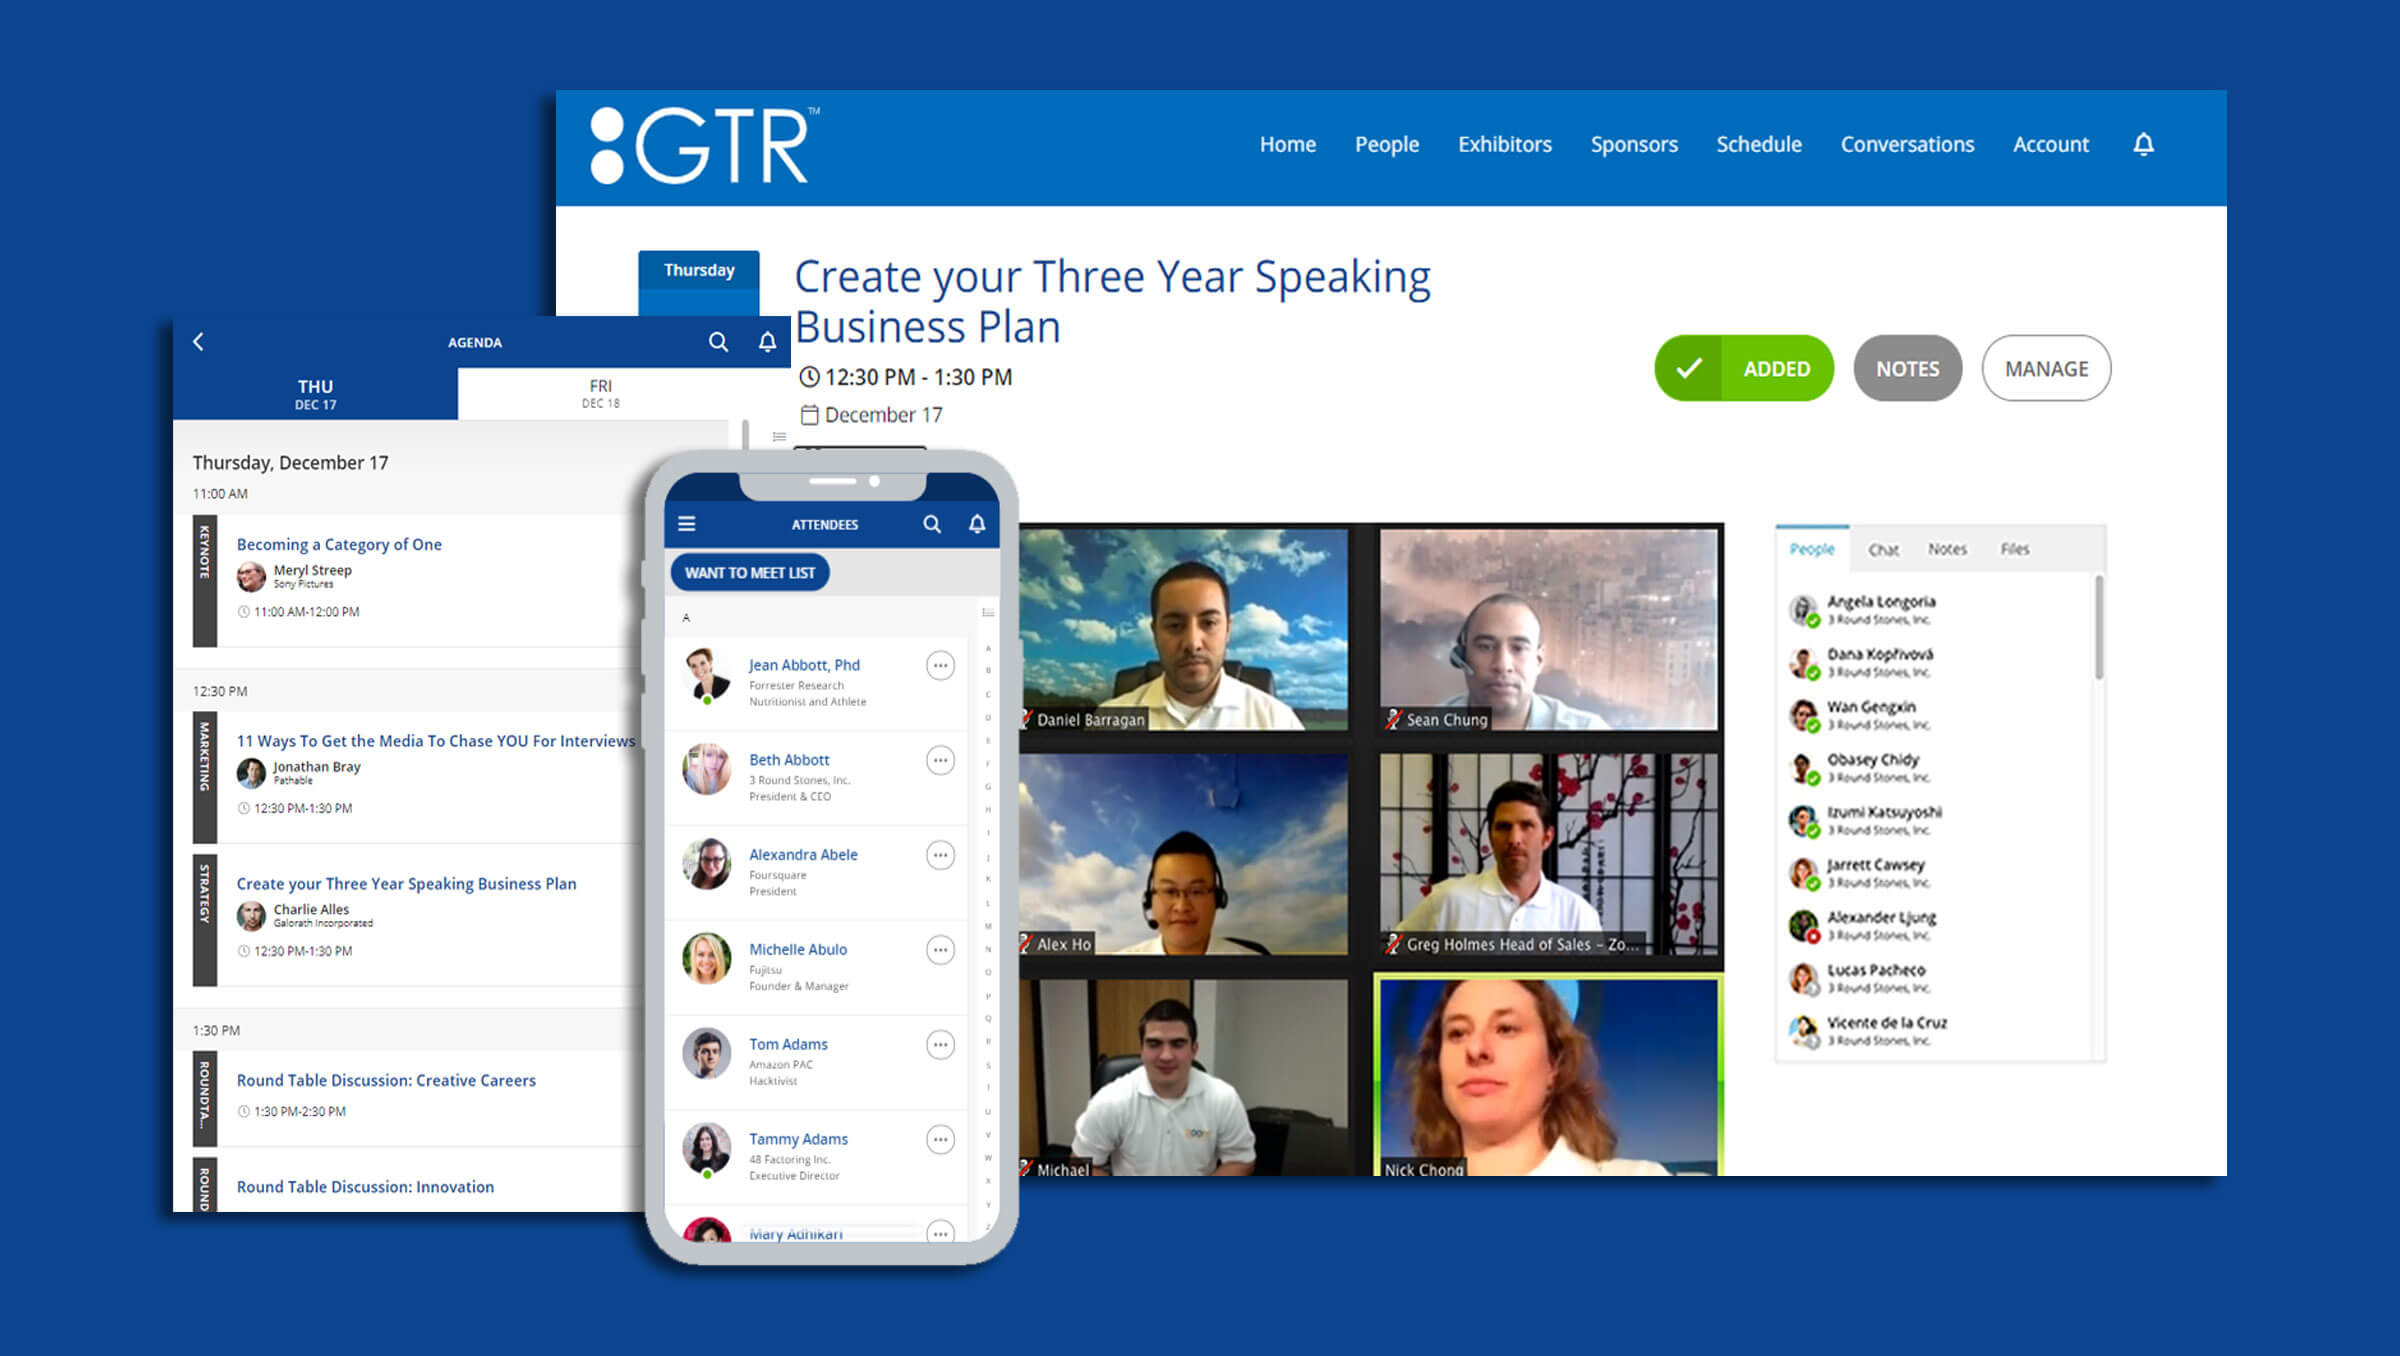 The GTR™ Virtual Event Platform